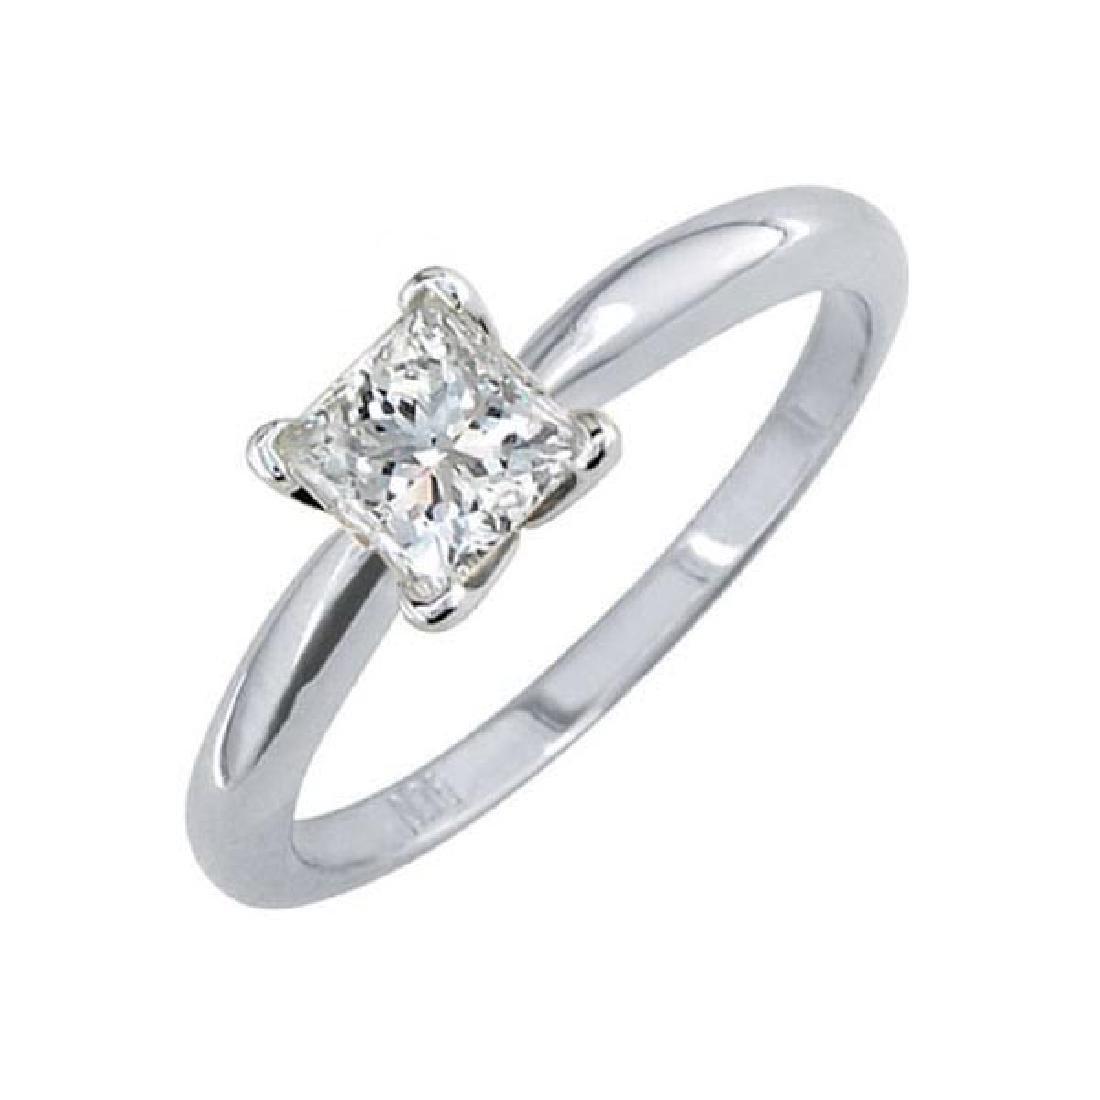 Certified 1.11 CTW Princess Diamond Solitaire 14k Ring